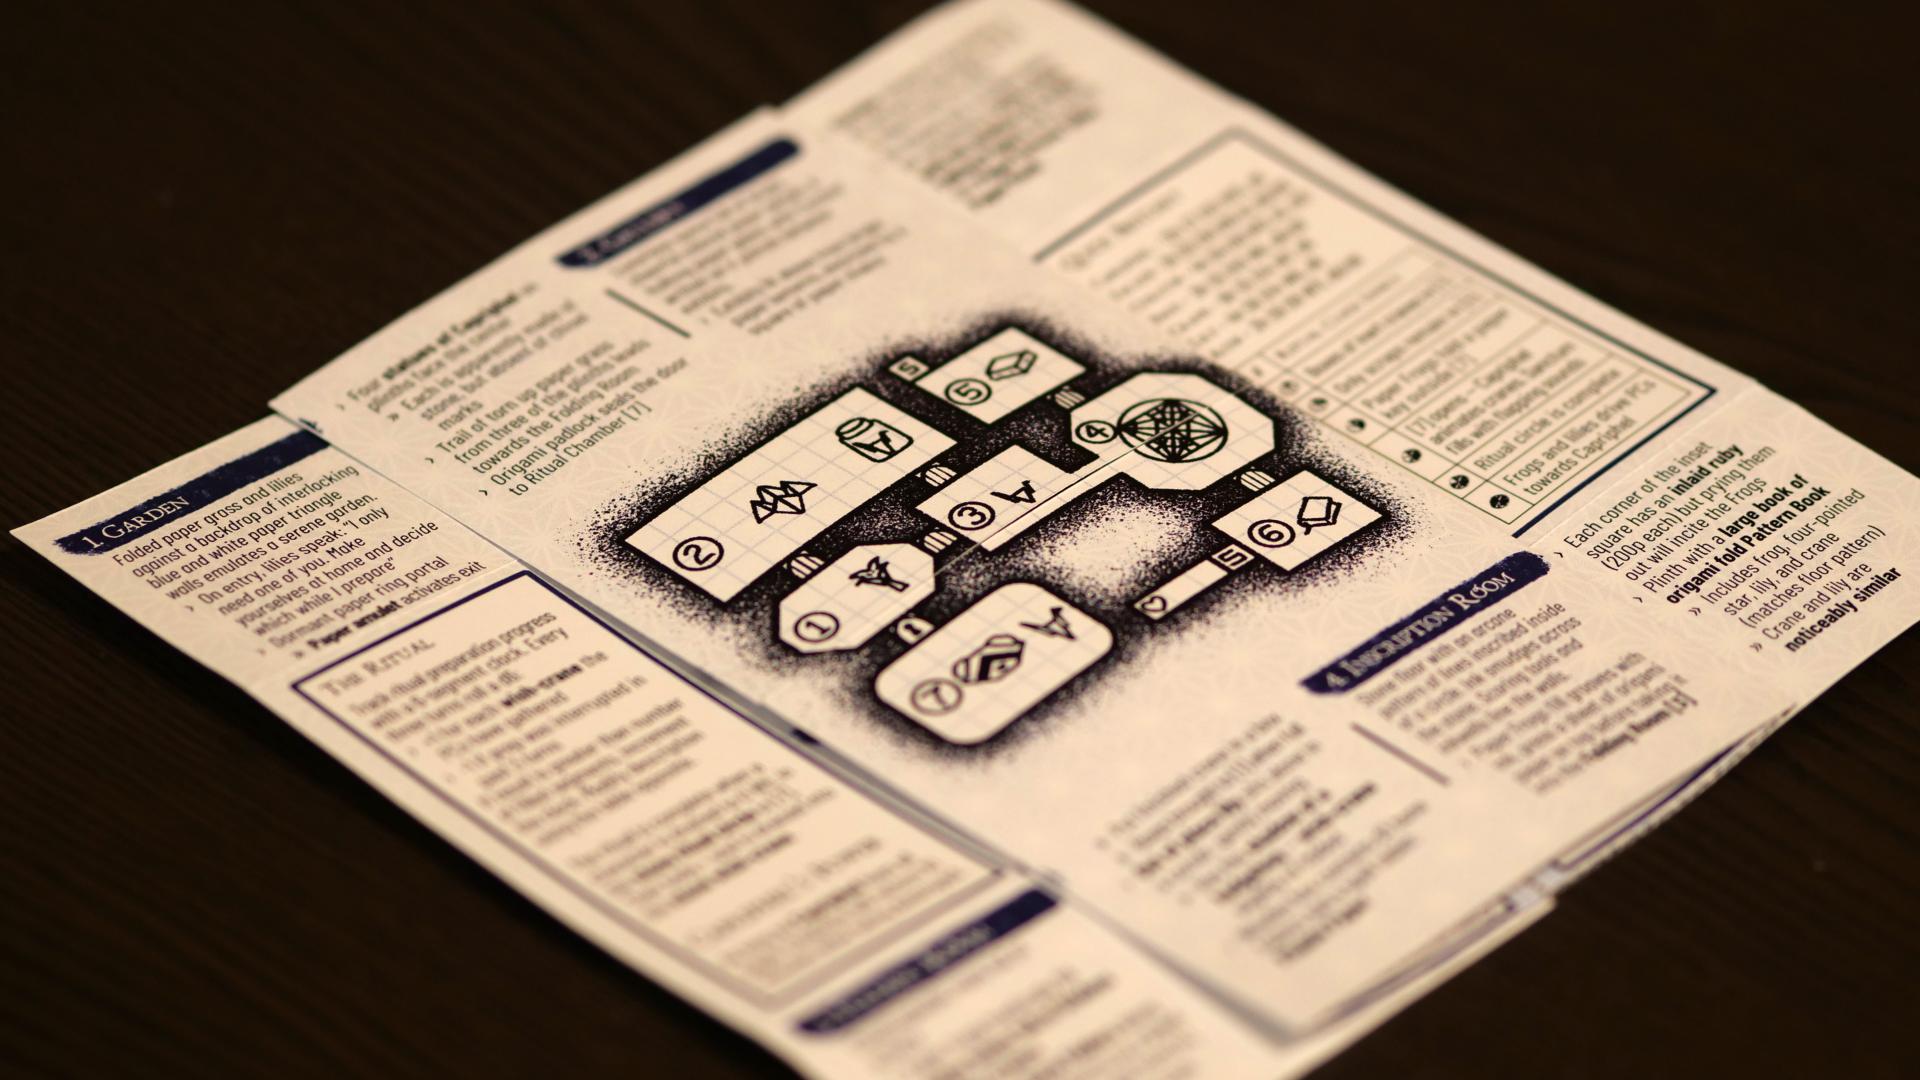 Image for Mausritter adventure Sanctum of the Ori Magi is genuine, folded-paper magic